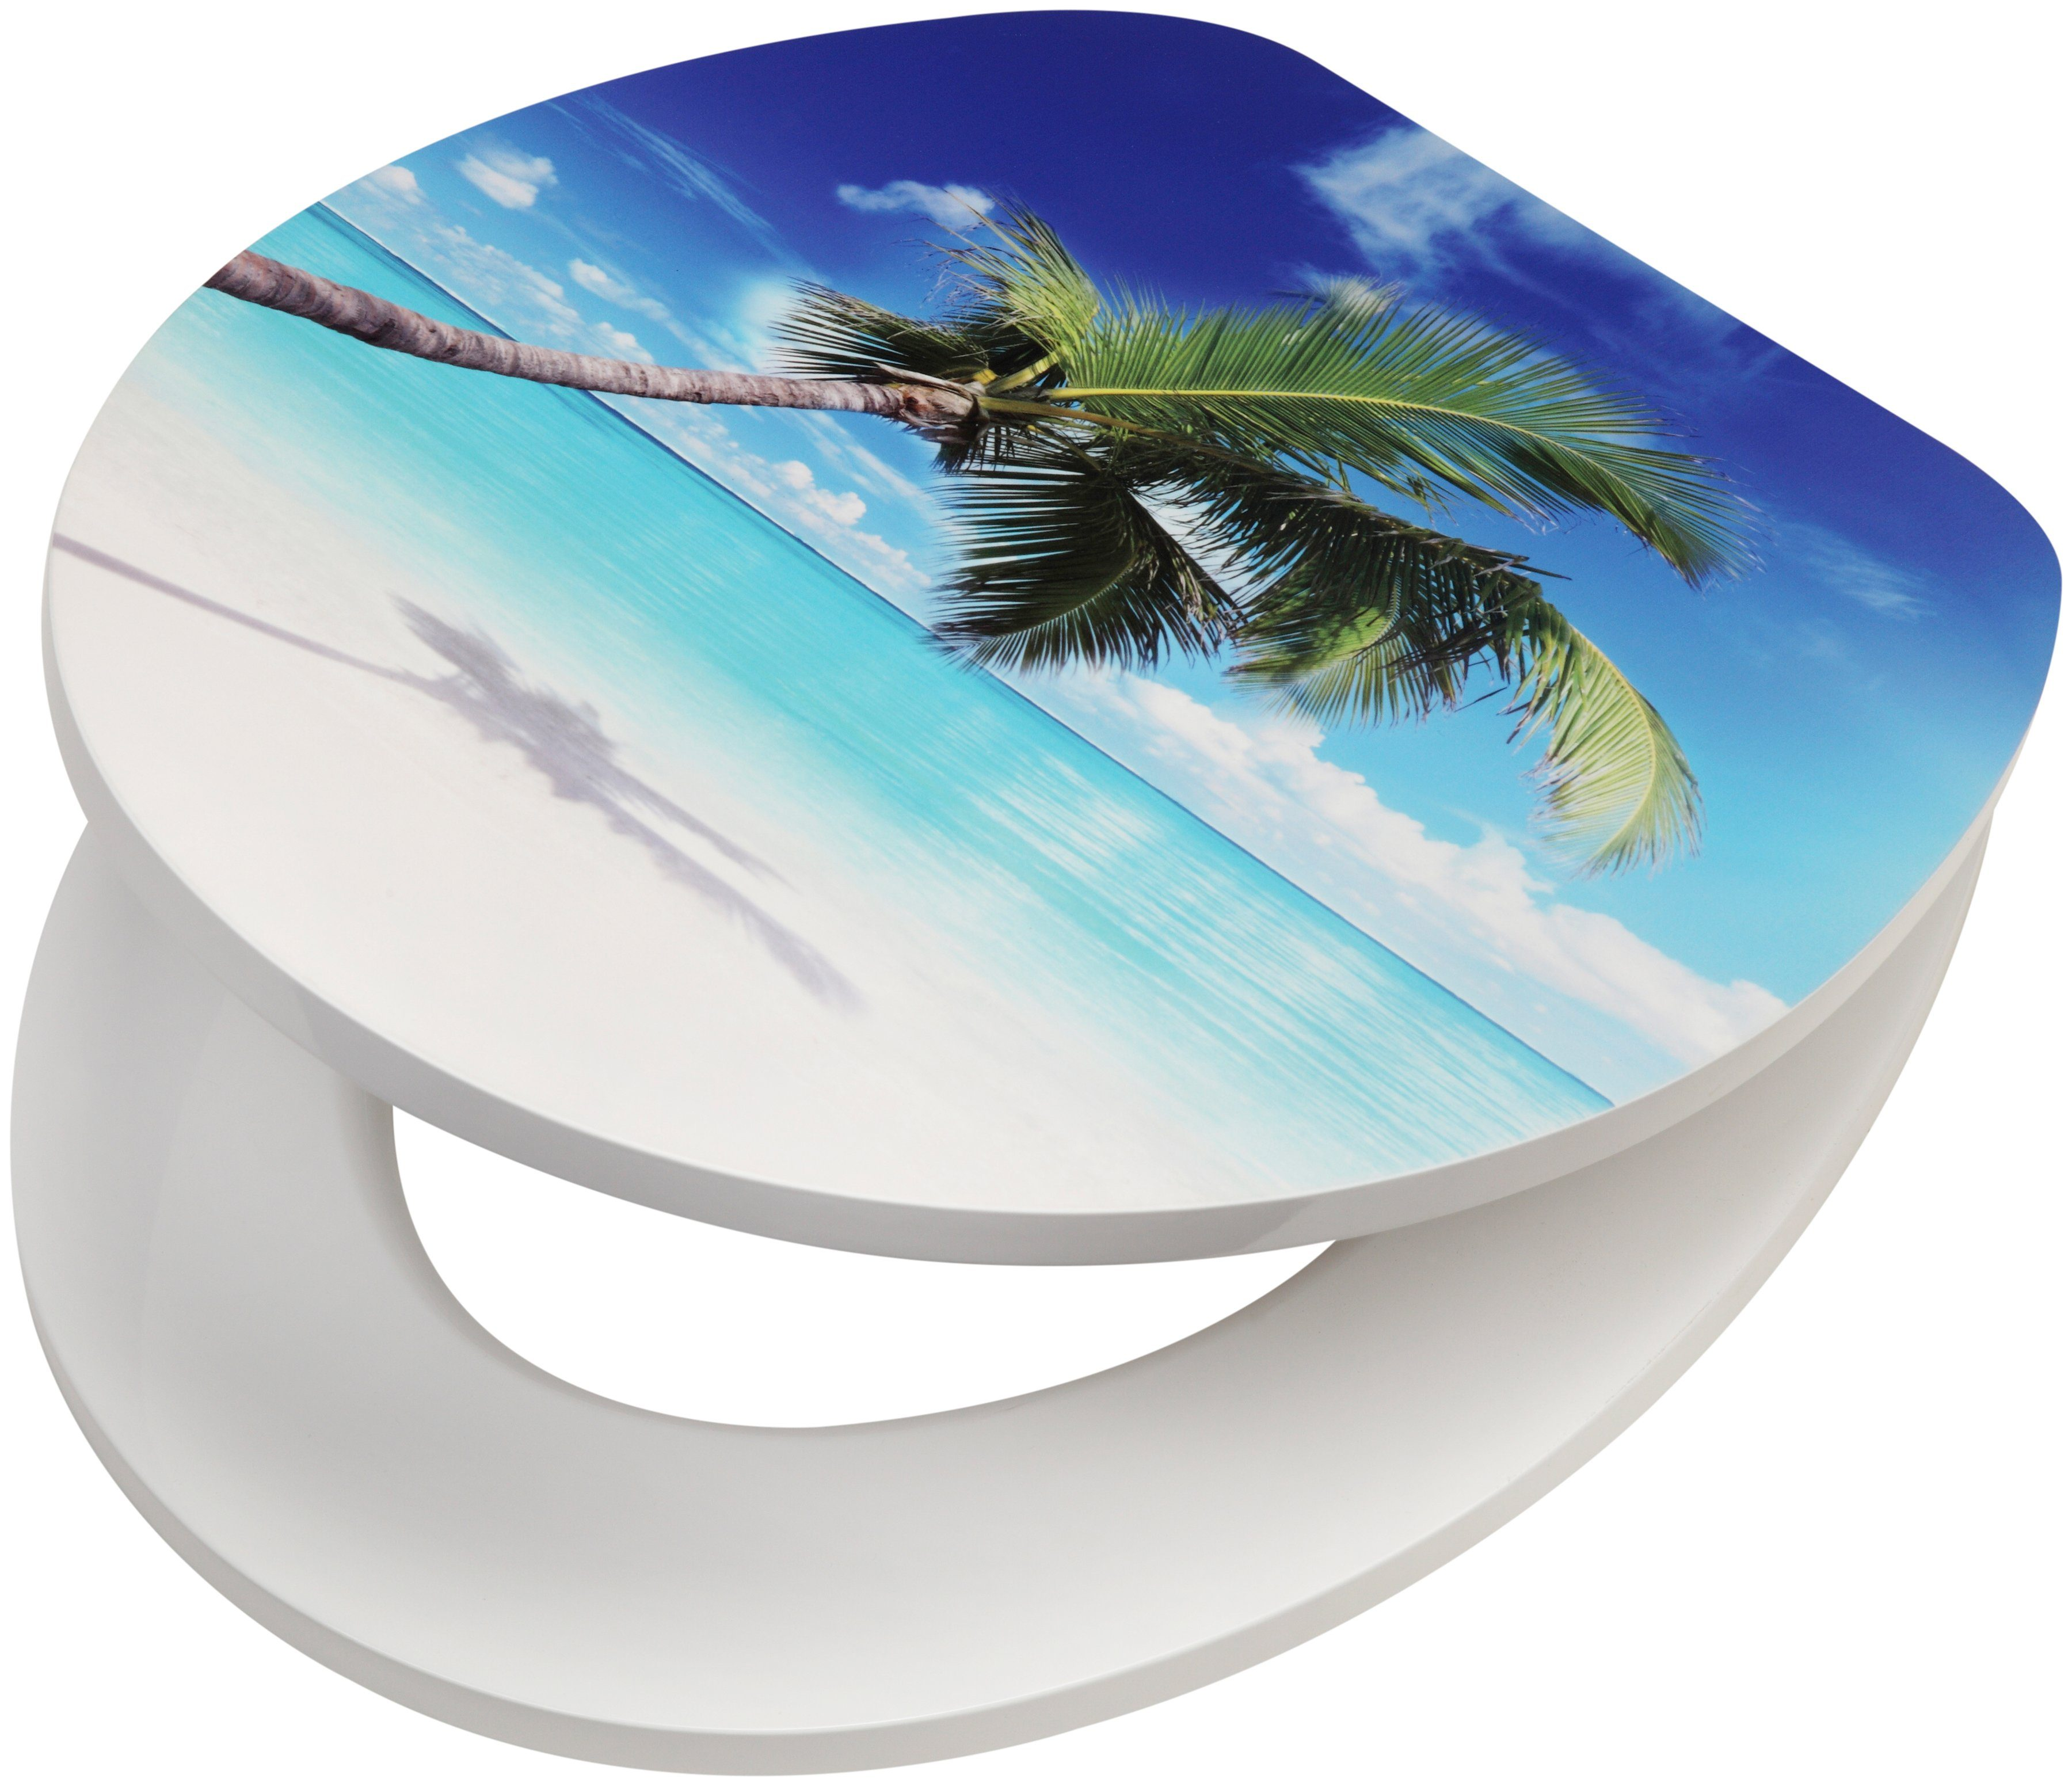 WC-Sitz »Beach«, MDF Toilettensitz mit Absenkautomatik